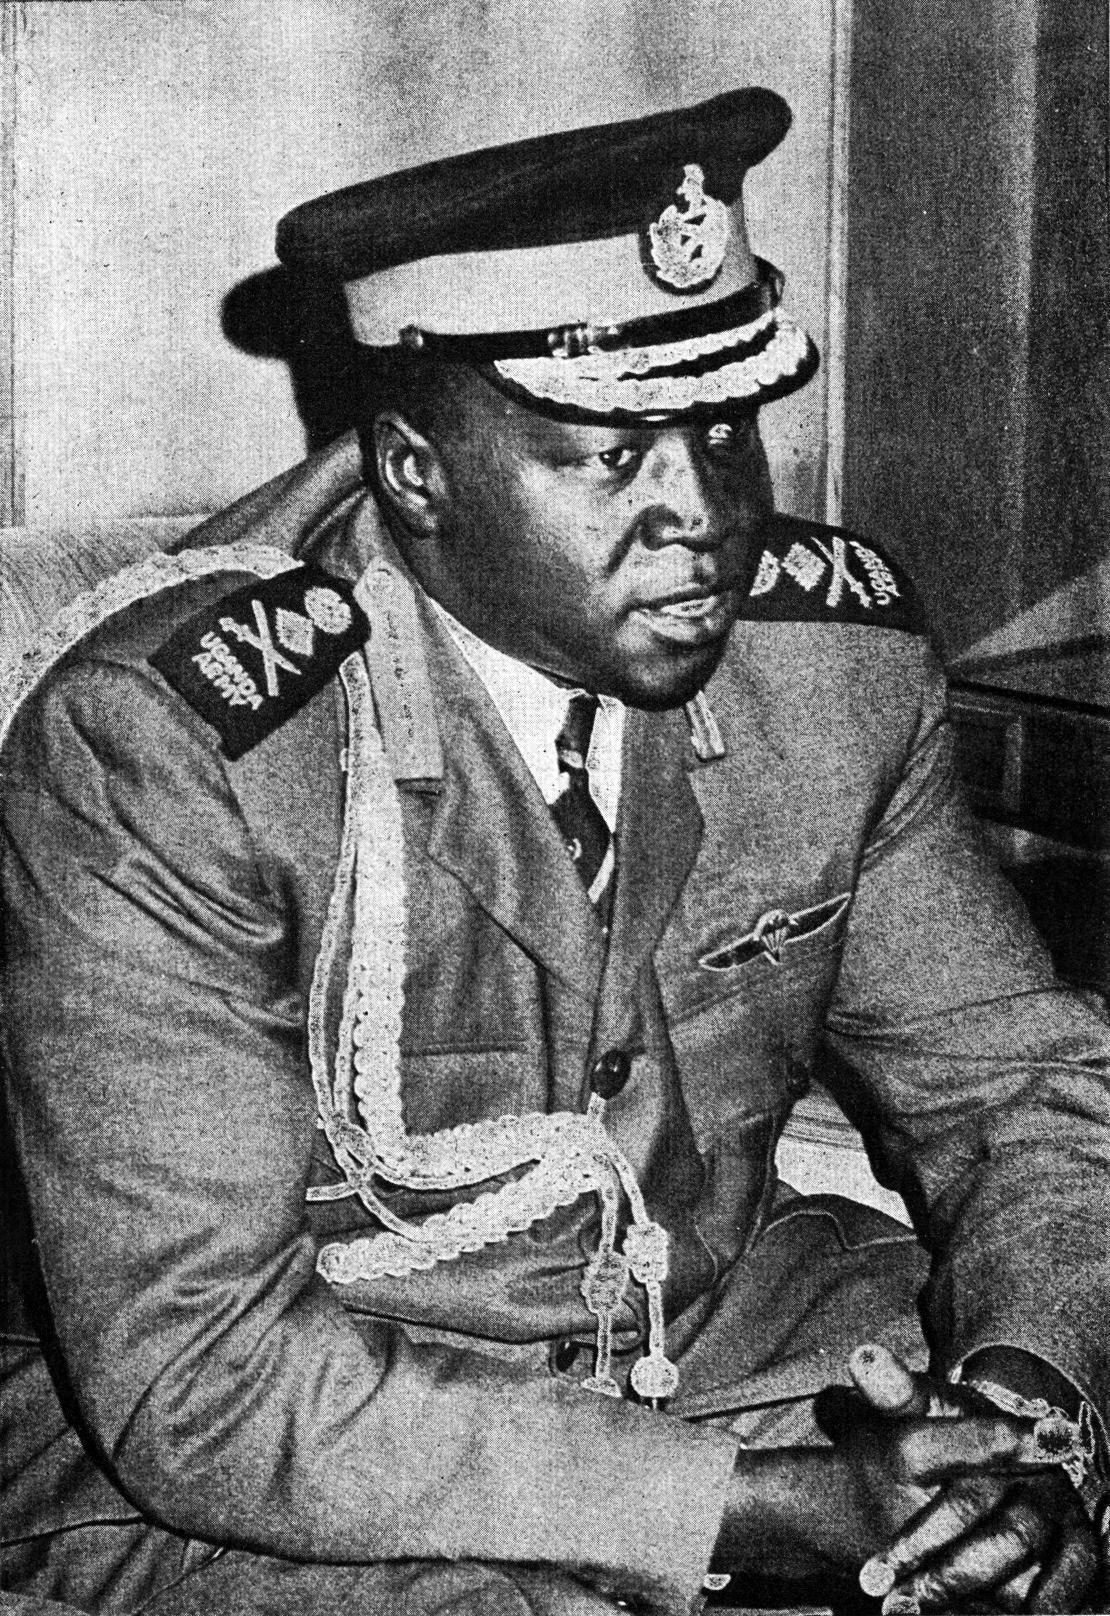 Depiction of Idi Amin